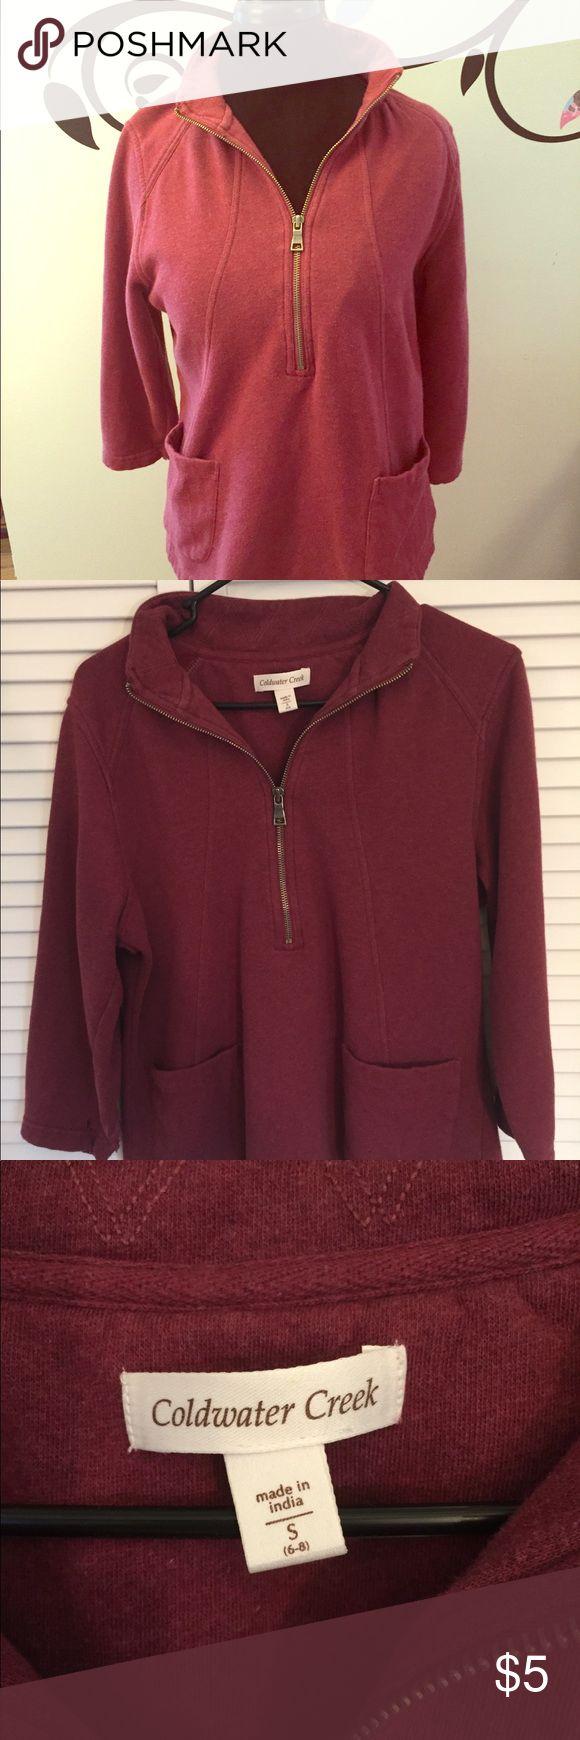 🆕EUC Coldwater Creek Maroon Half-Zip Sweatshirt 🆕EUC Coldwater Creek Maroon Half-Zip Sweatshirt. Size Small but would definitely fit a Medium also. Coldwater Creek Tops Sweatshirts & Hoodies